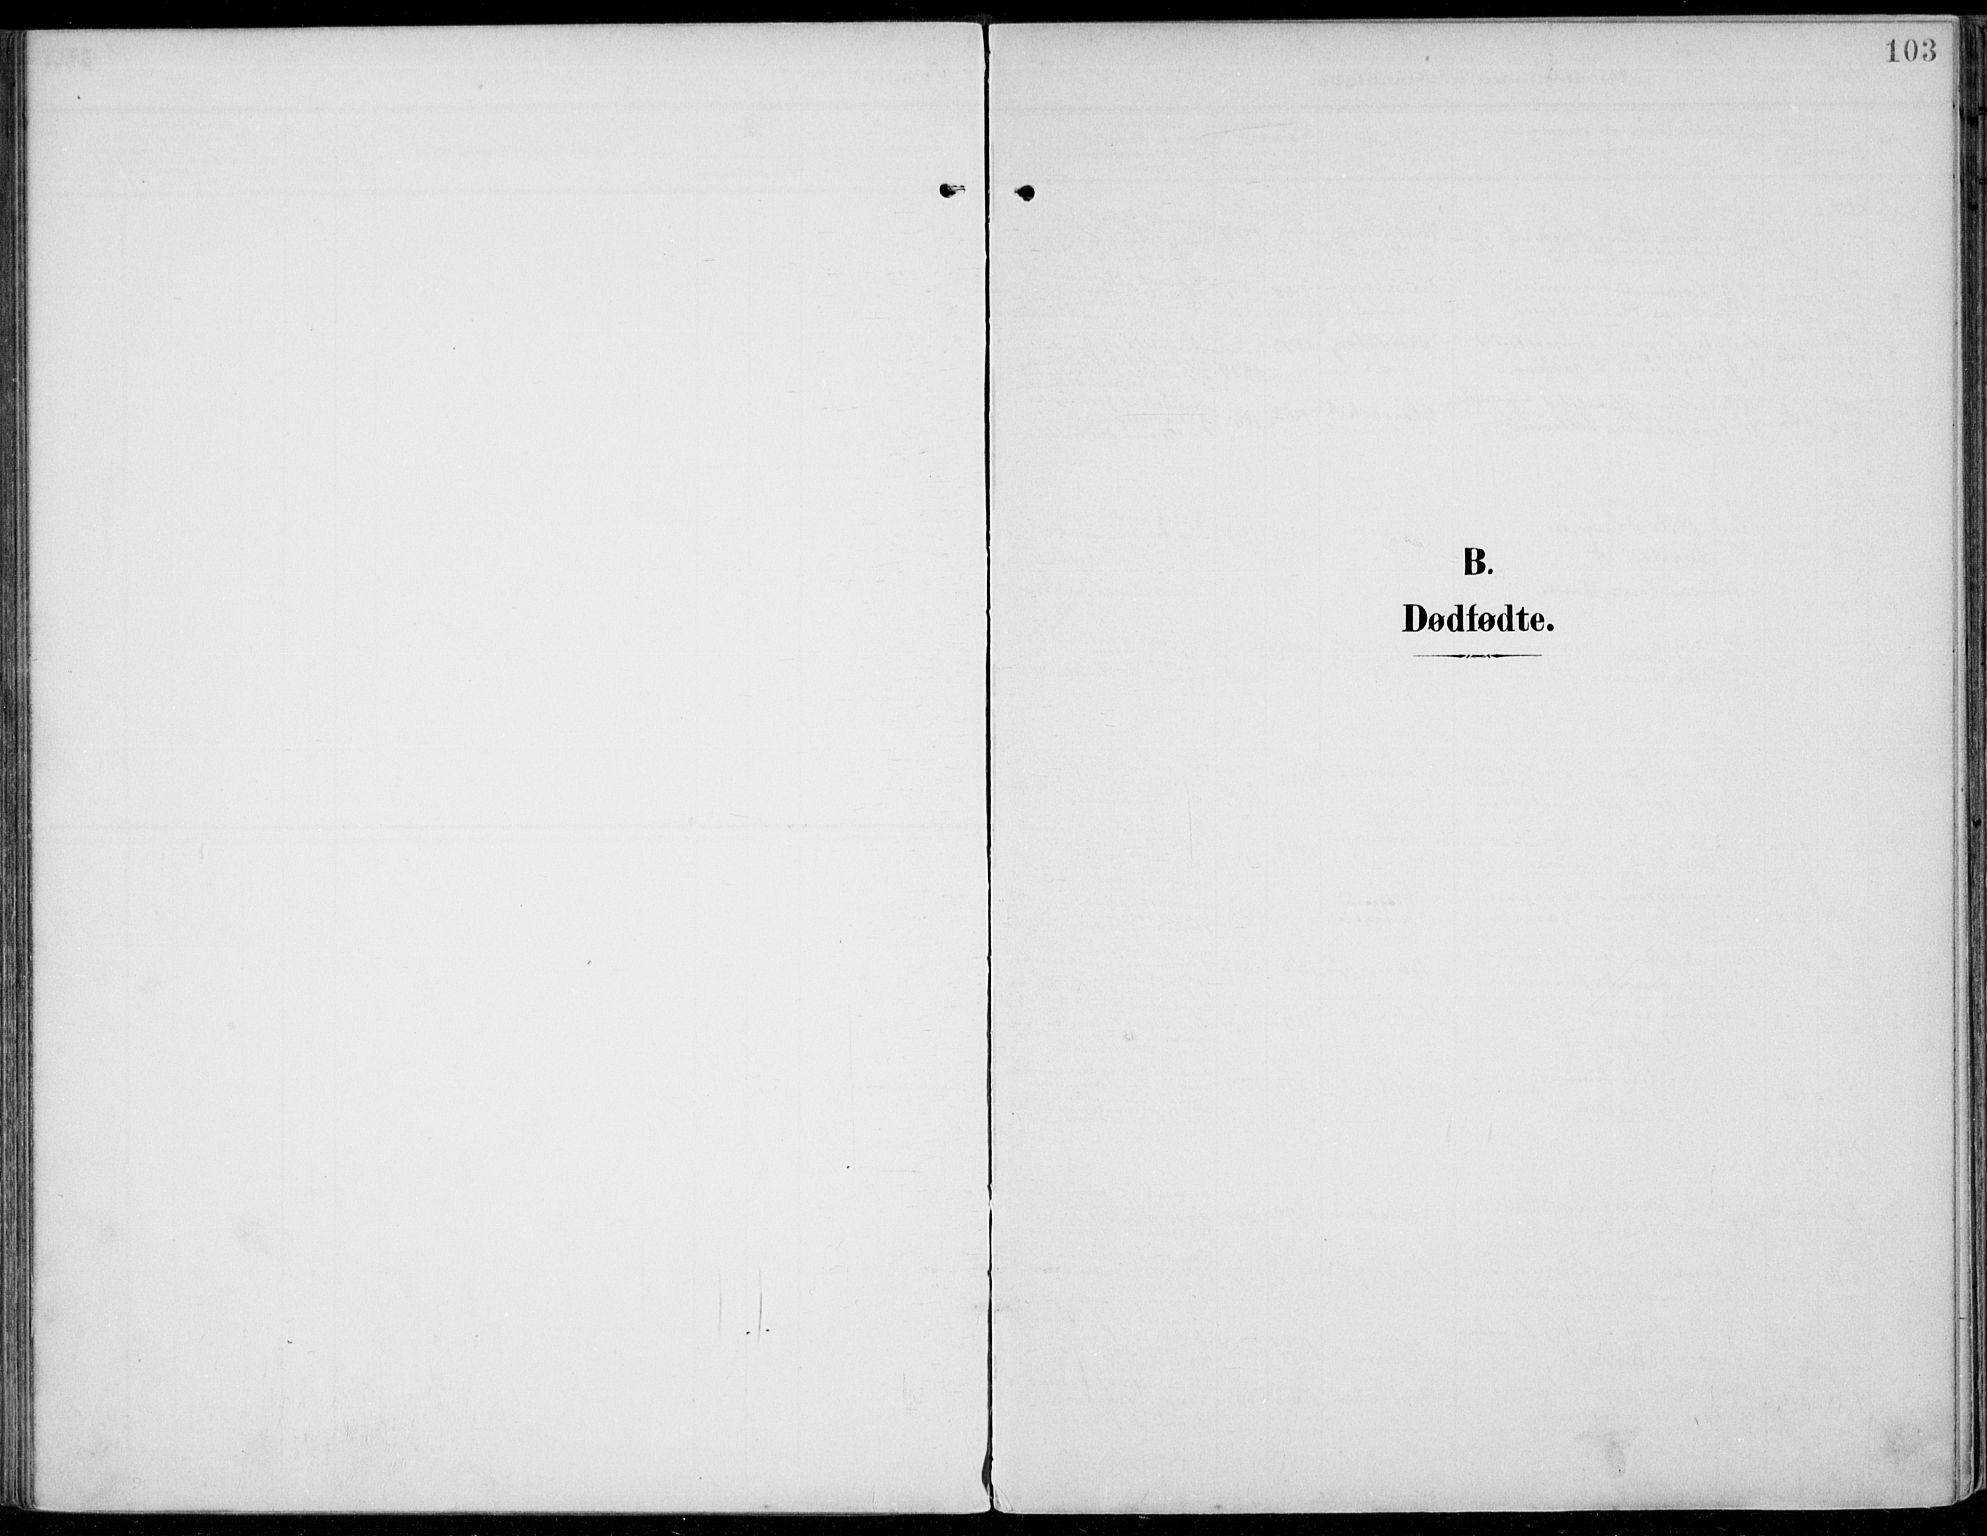 SAH, Jevnaker prestekontor, Ministerialbok nr. 11, 1902-1913, s. 103